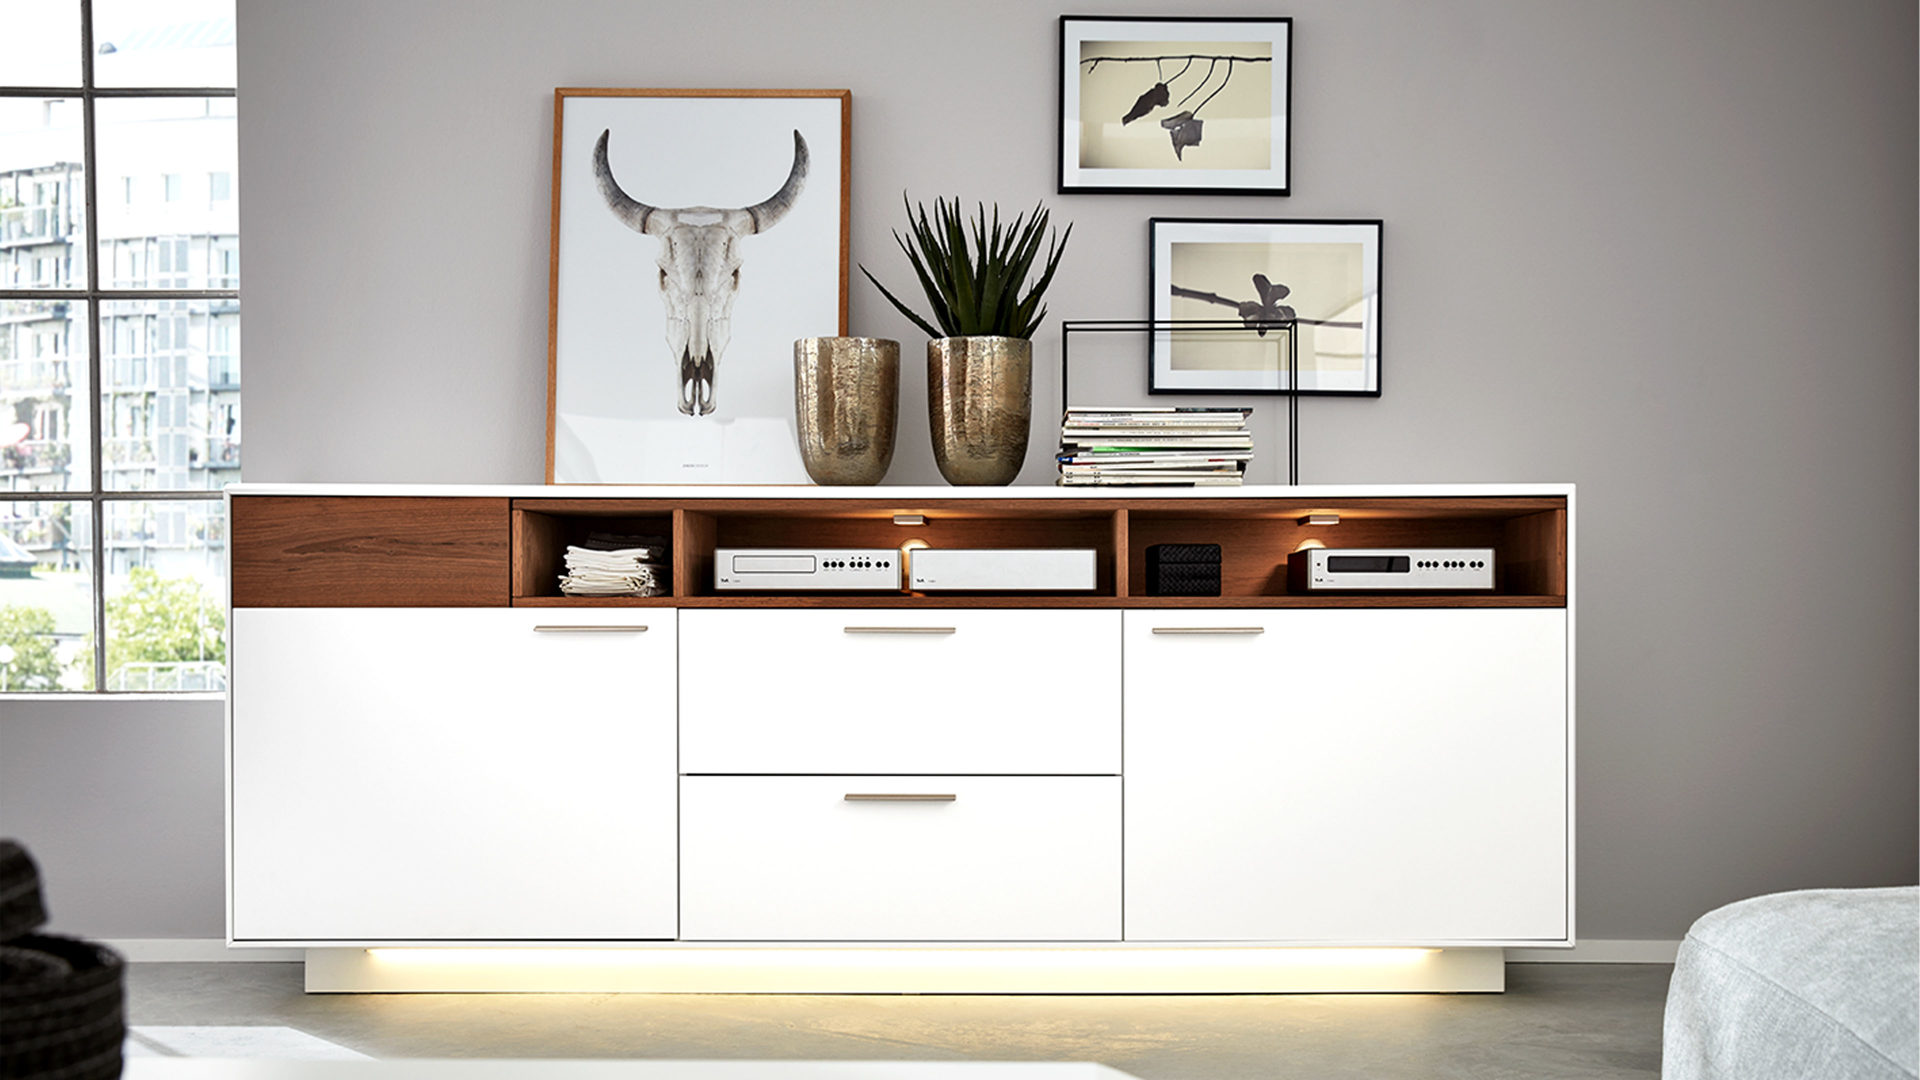 Möbel Böck, Räume, Schlafzimmer, Regale + Raumteiler ...